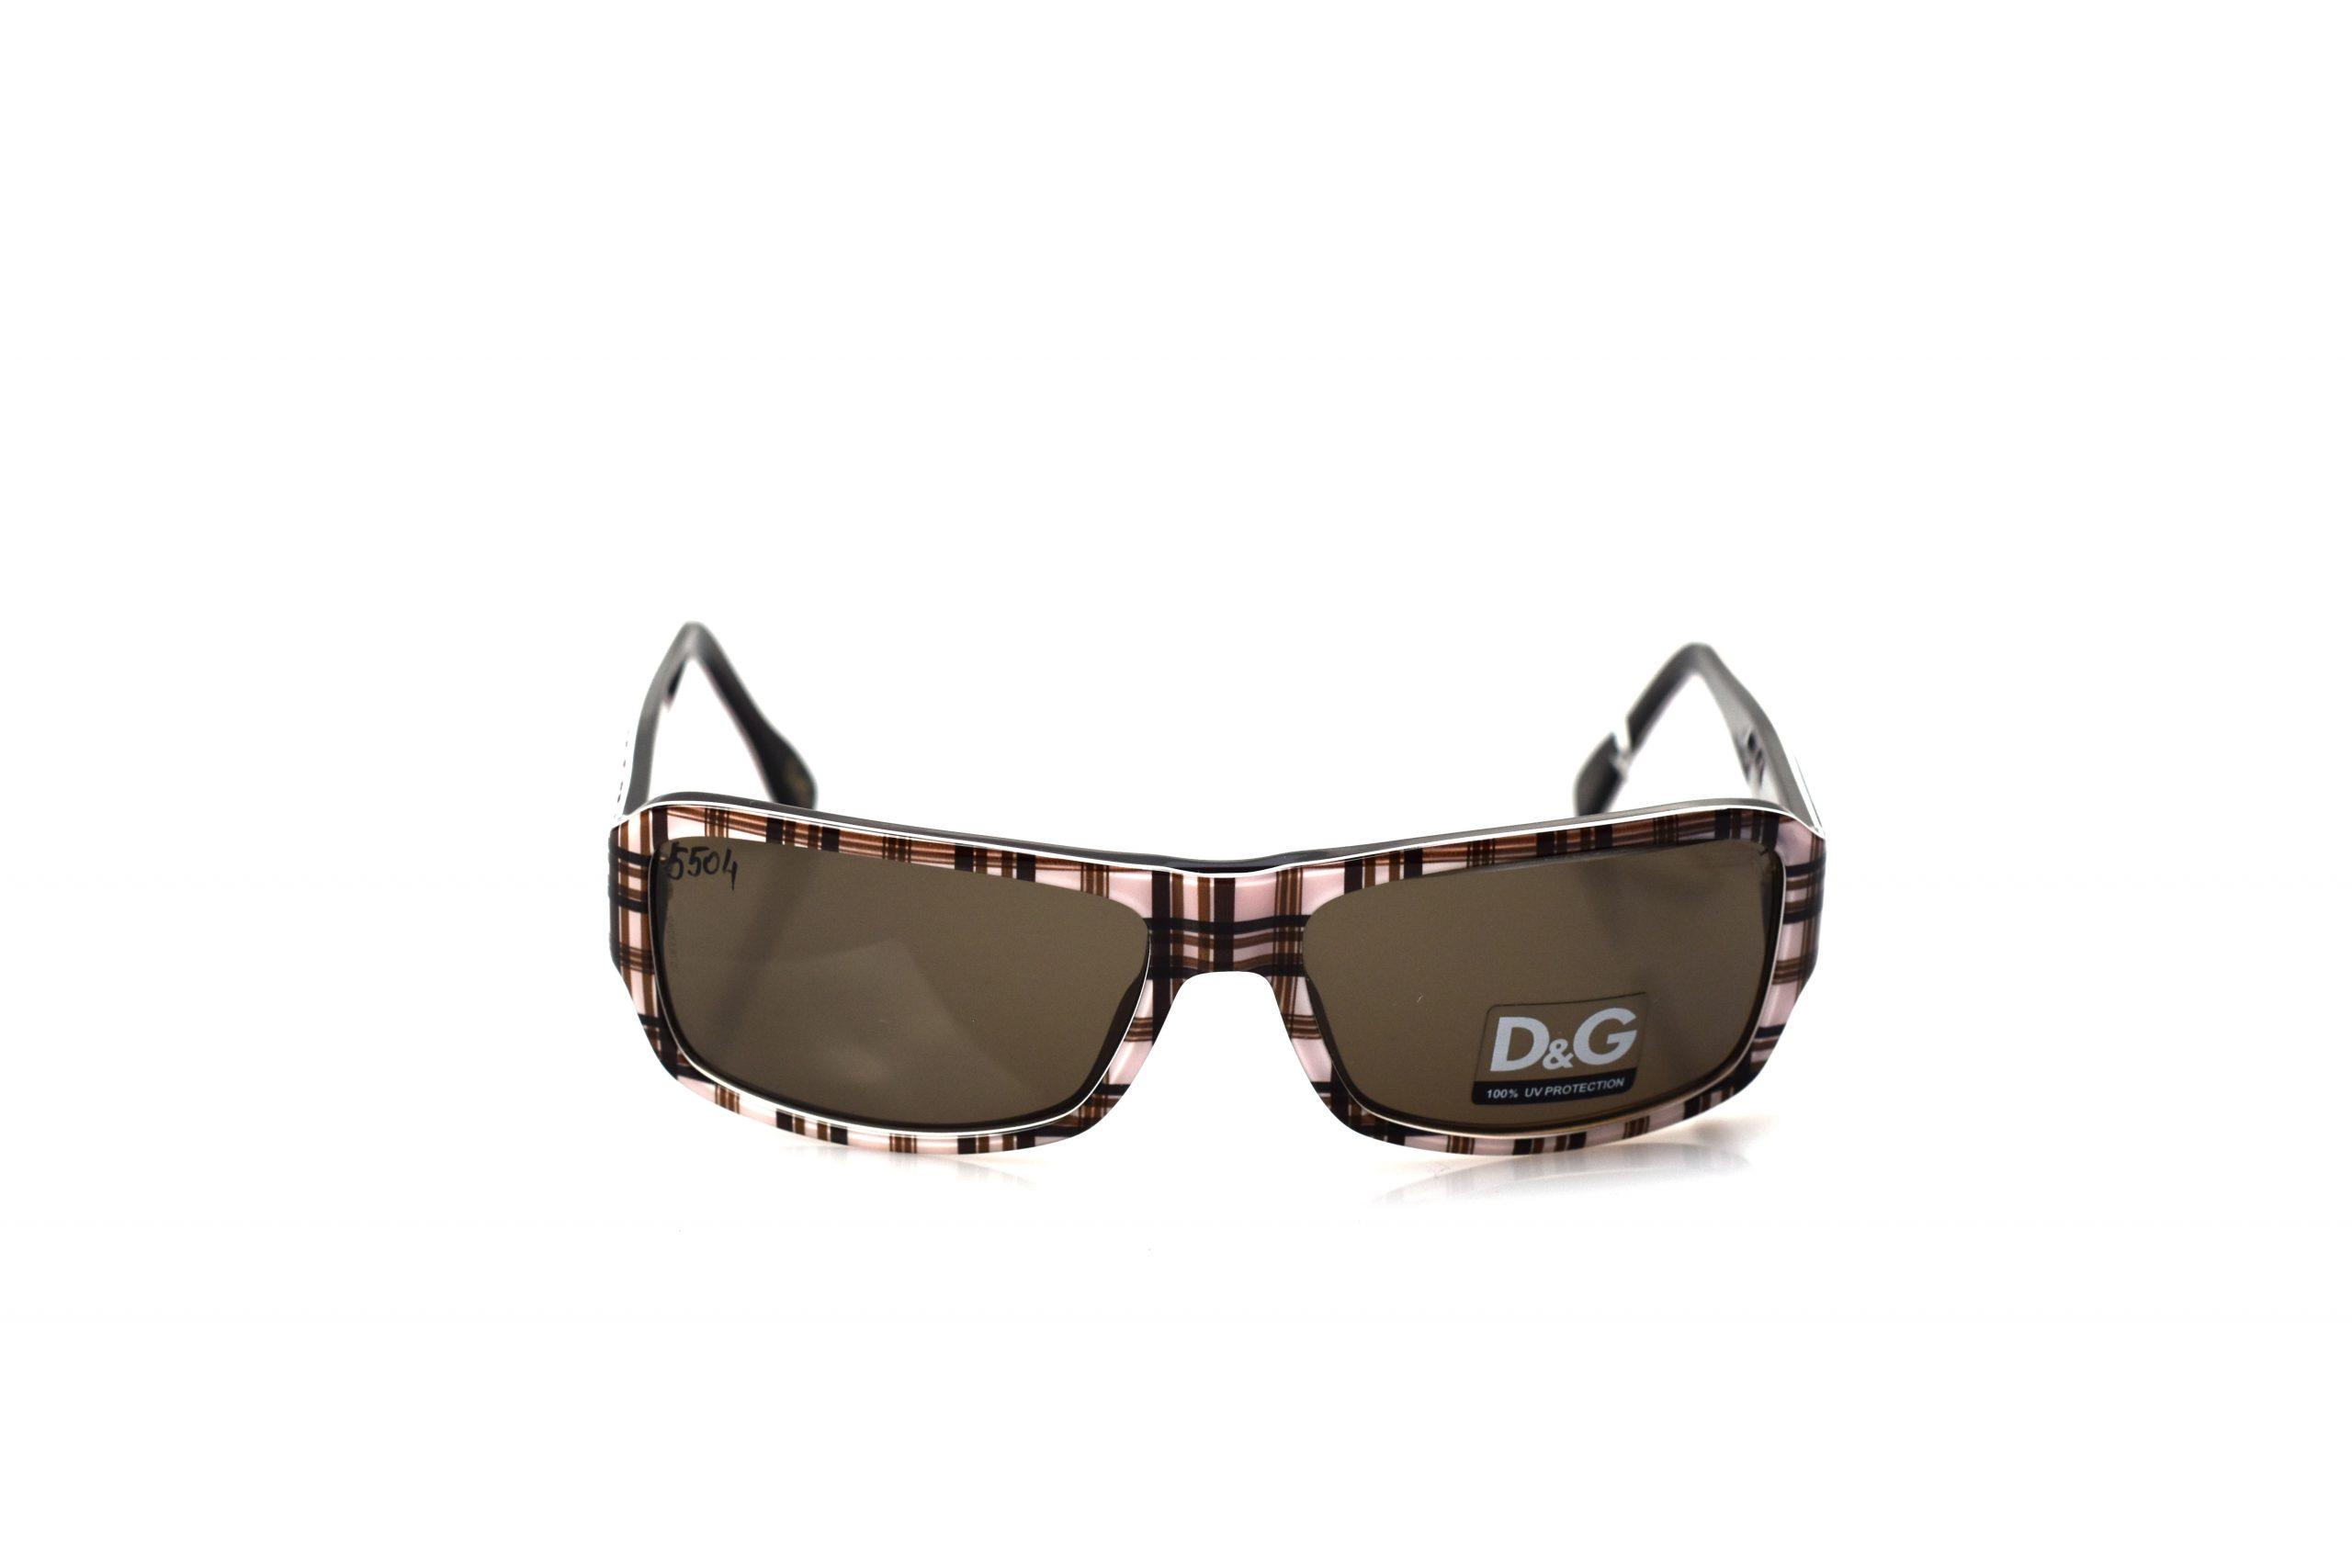 DG 3060 3N DOLCE&GABBANA